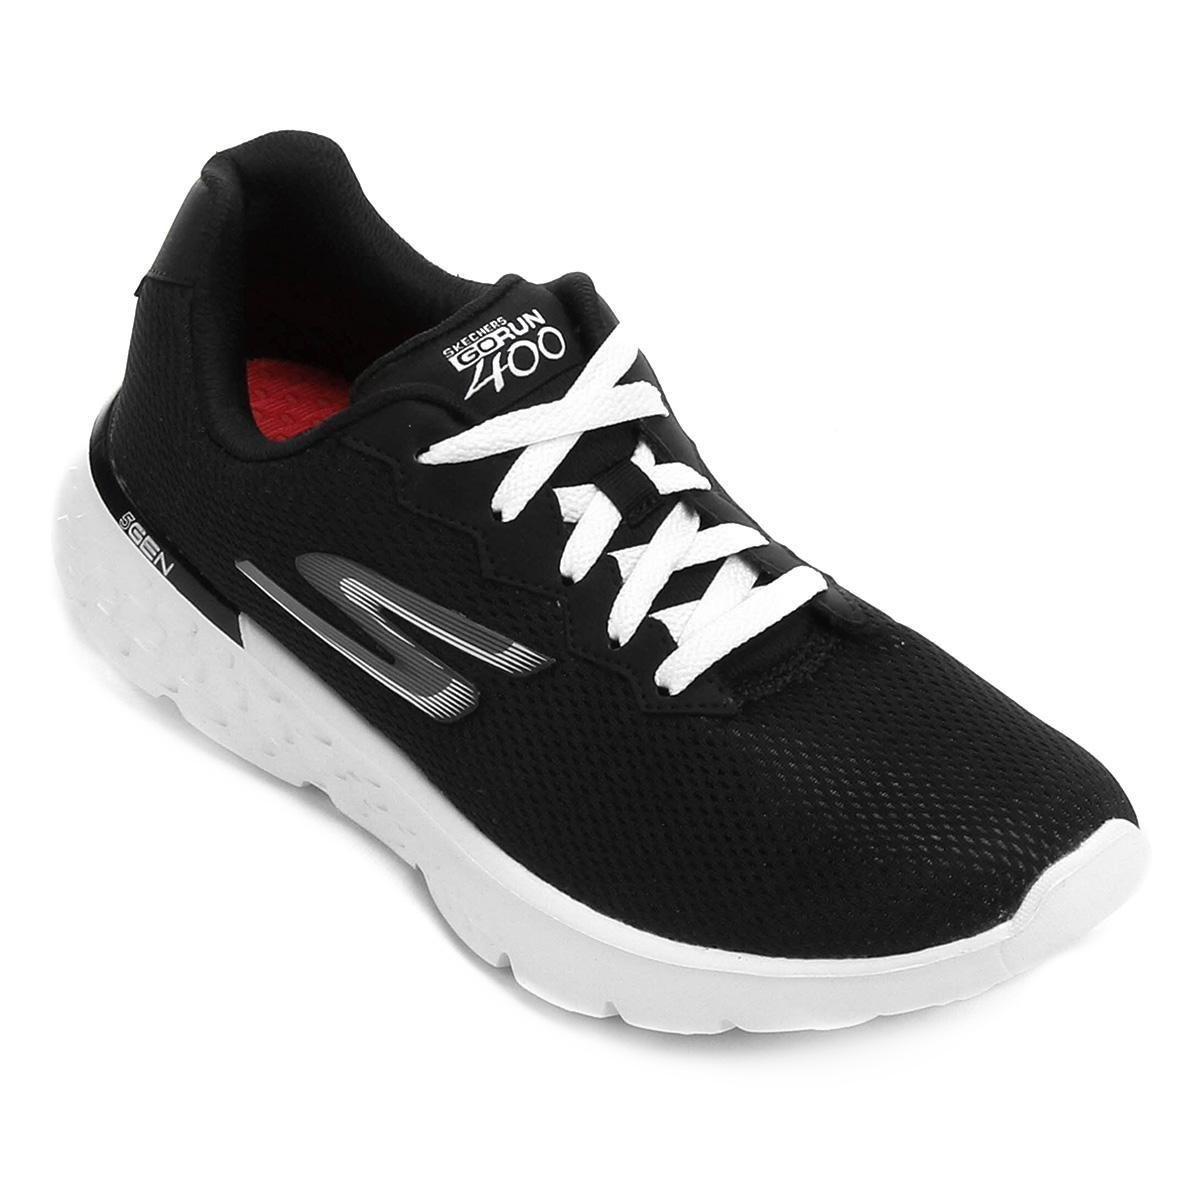 Tênis Skechers Go Run 400 Feminino - Preto e Branco - Compre Agora ... b8c60b80b750b